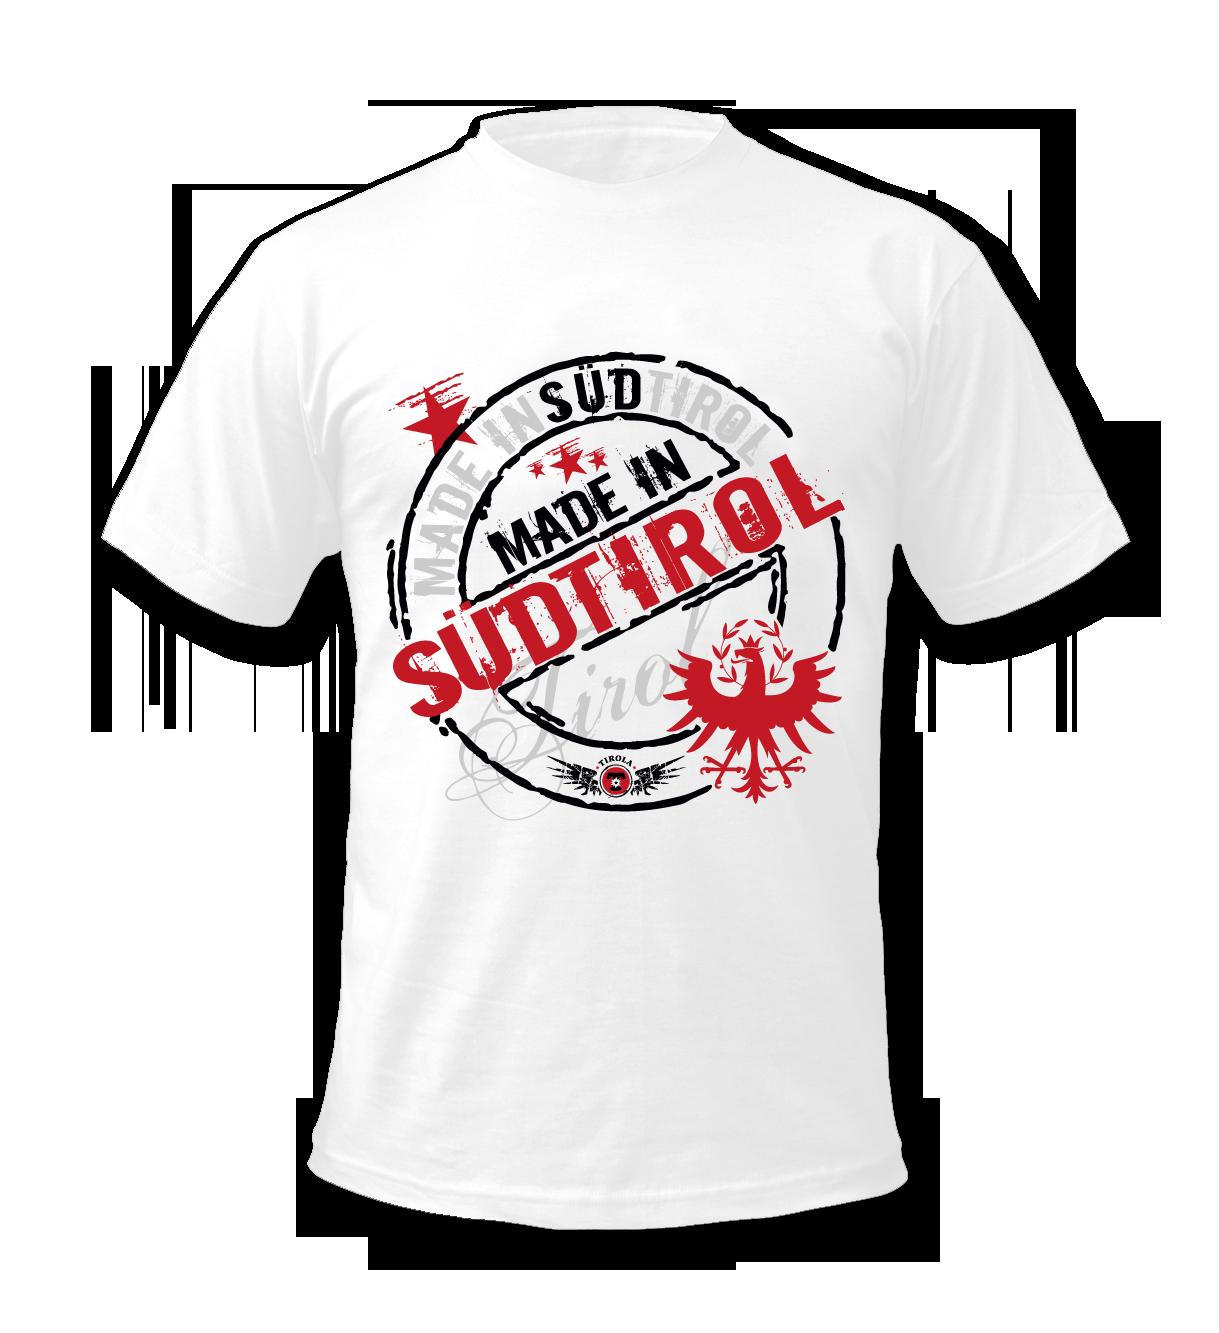 Made in s dtirol. Sunset clipart shirt hawaii